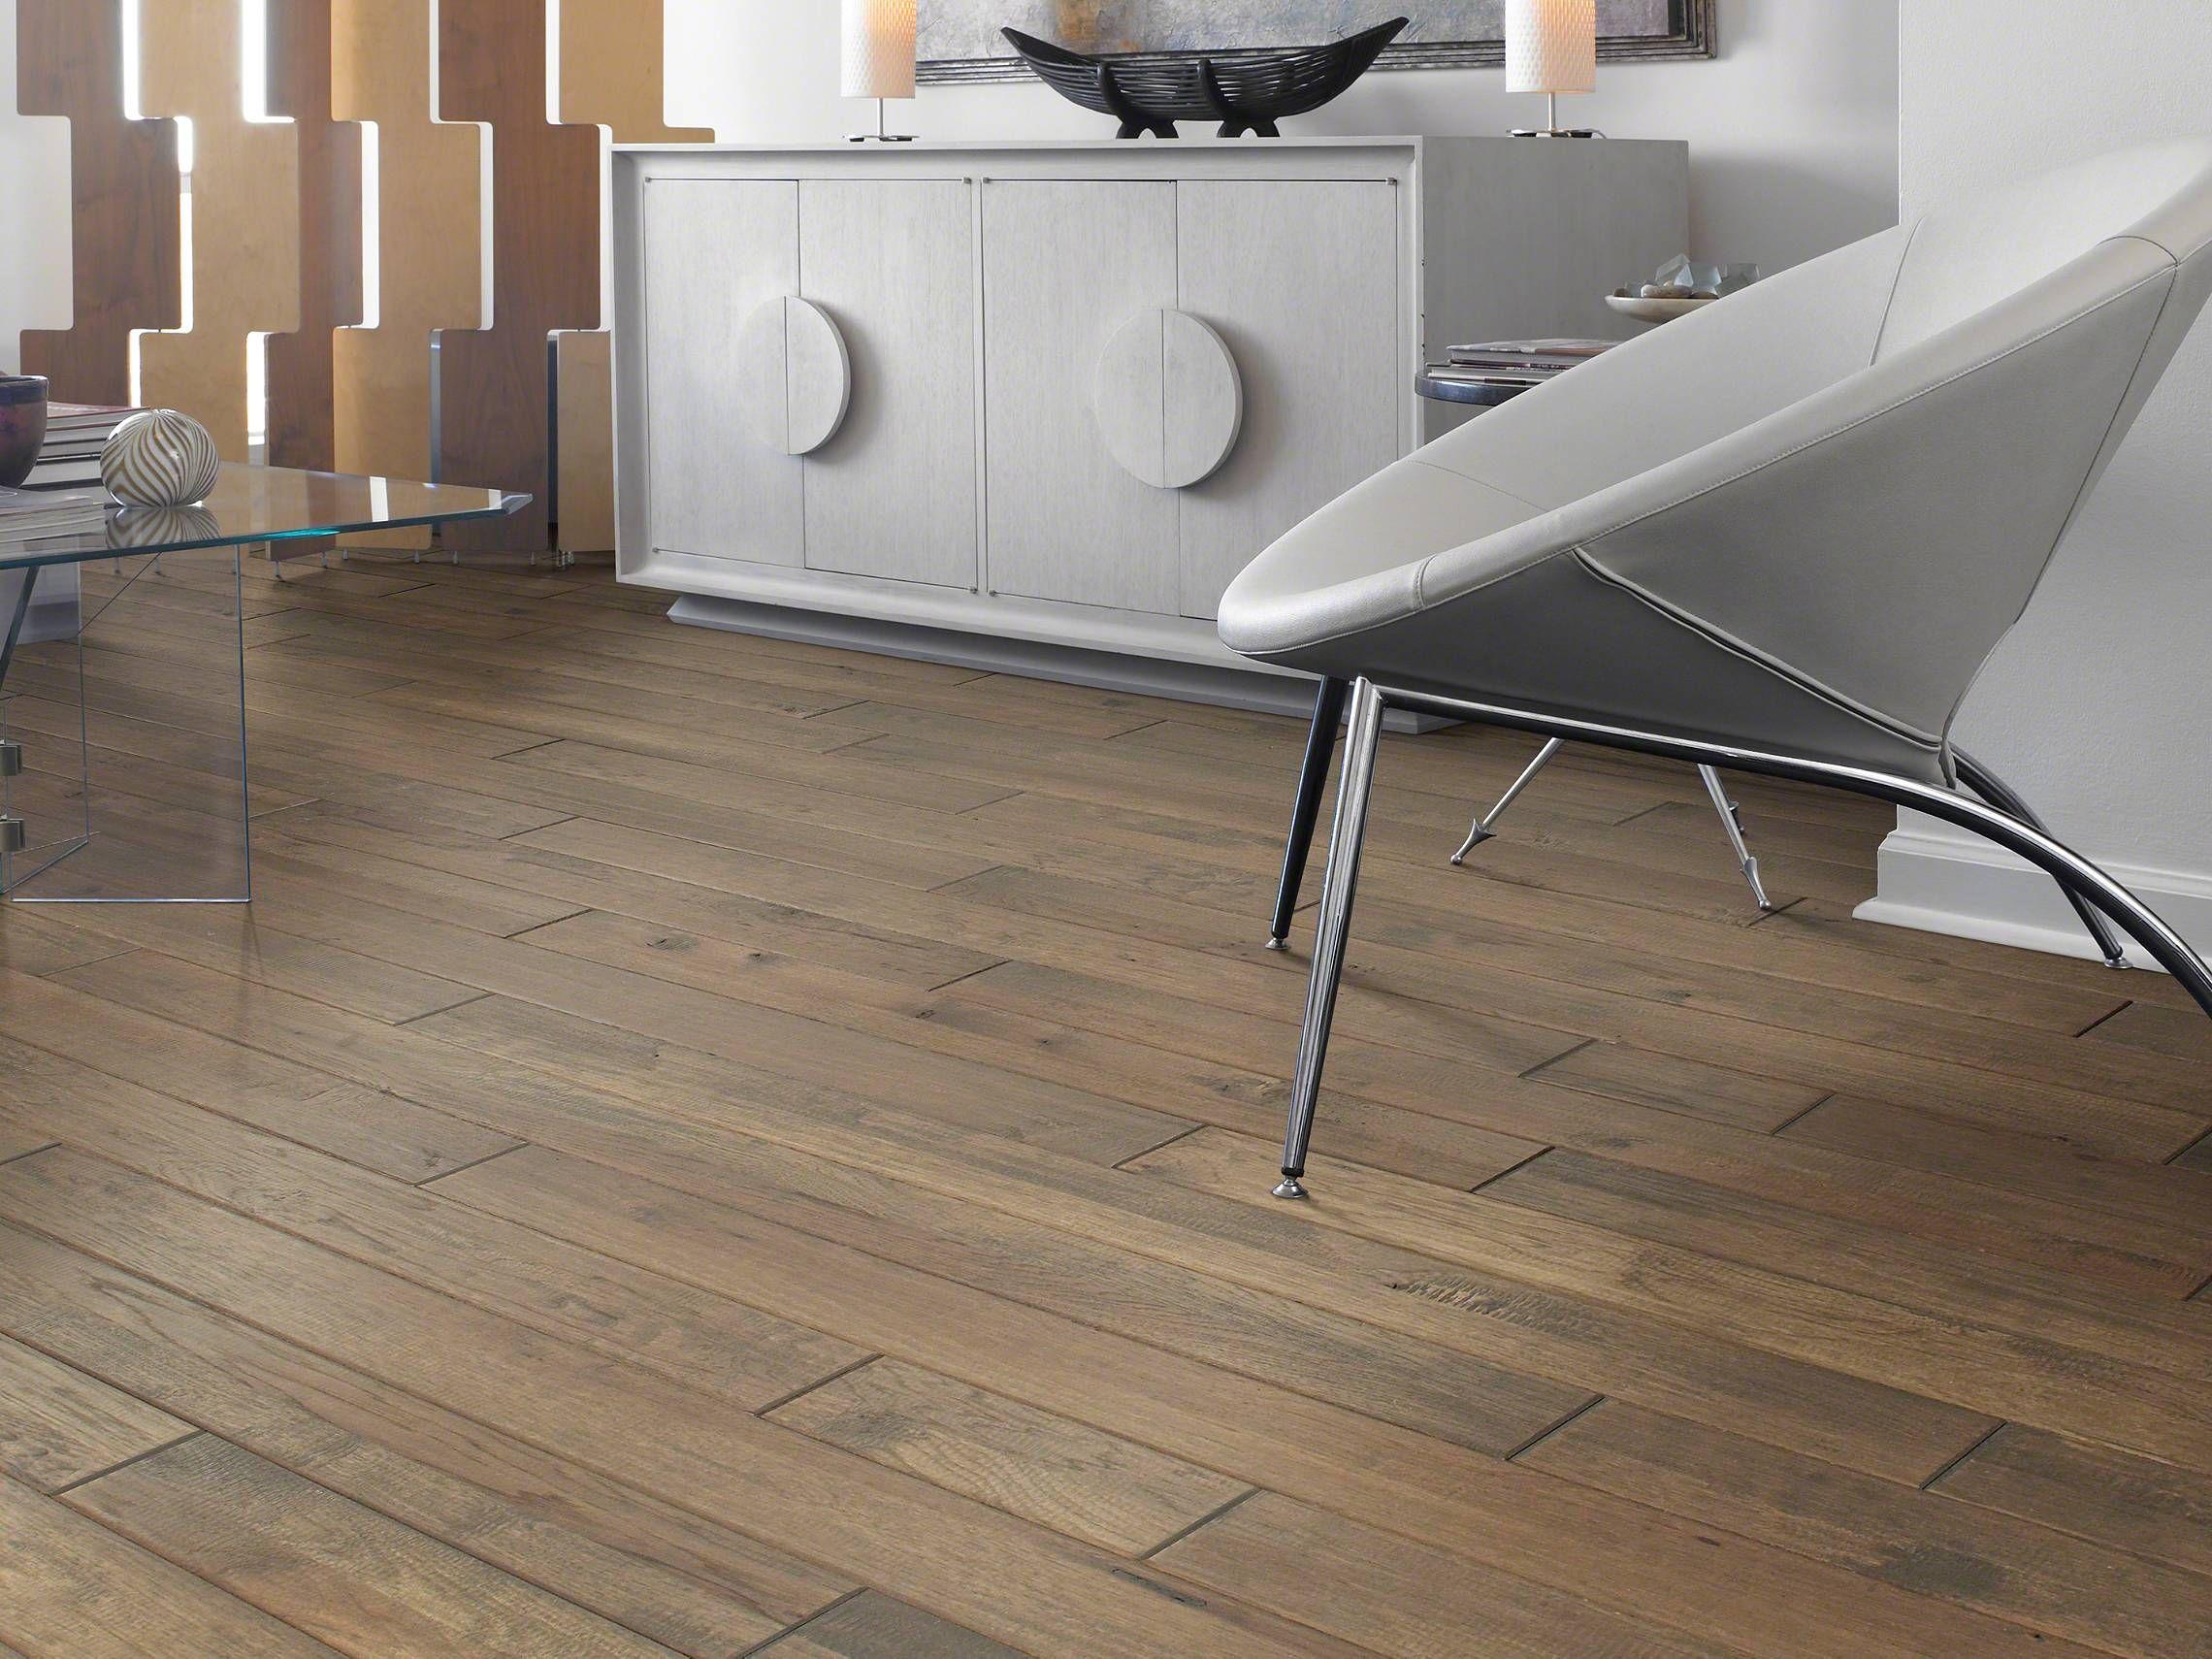 Hardwood Flooring Shaw Wood Flooring Shaw Hardwood